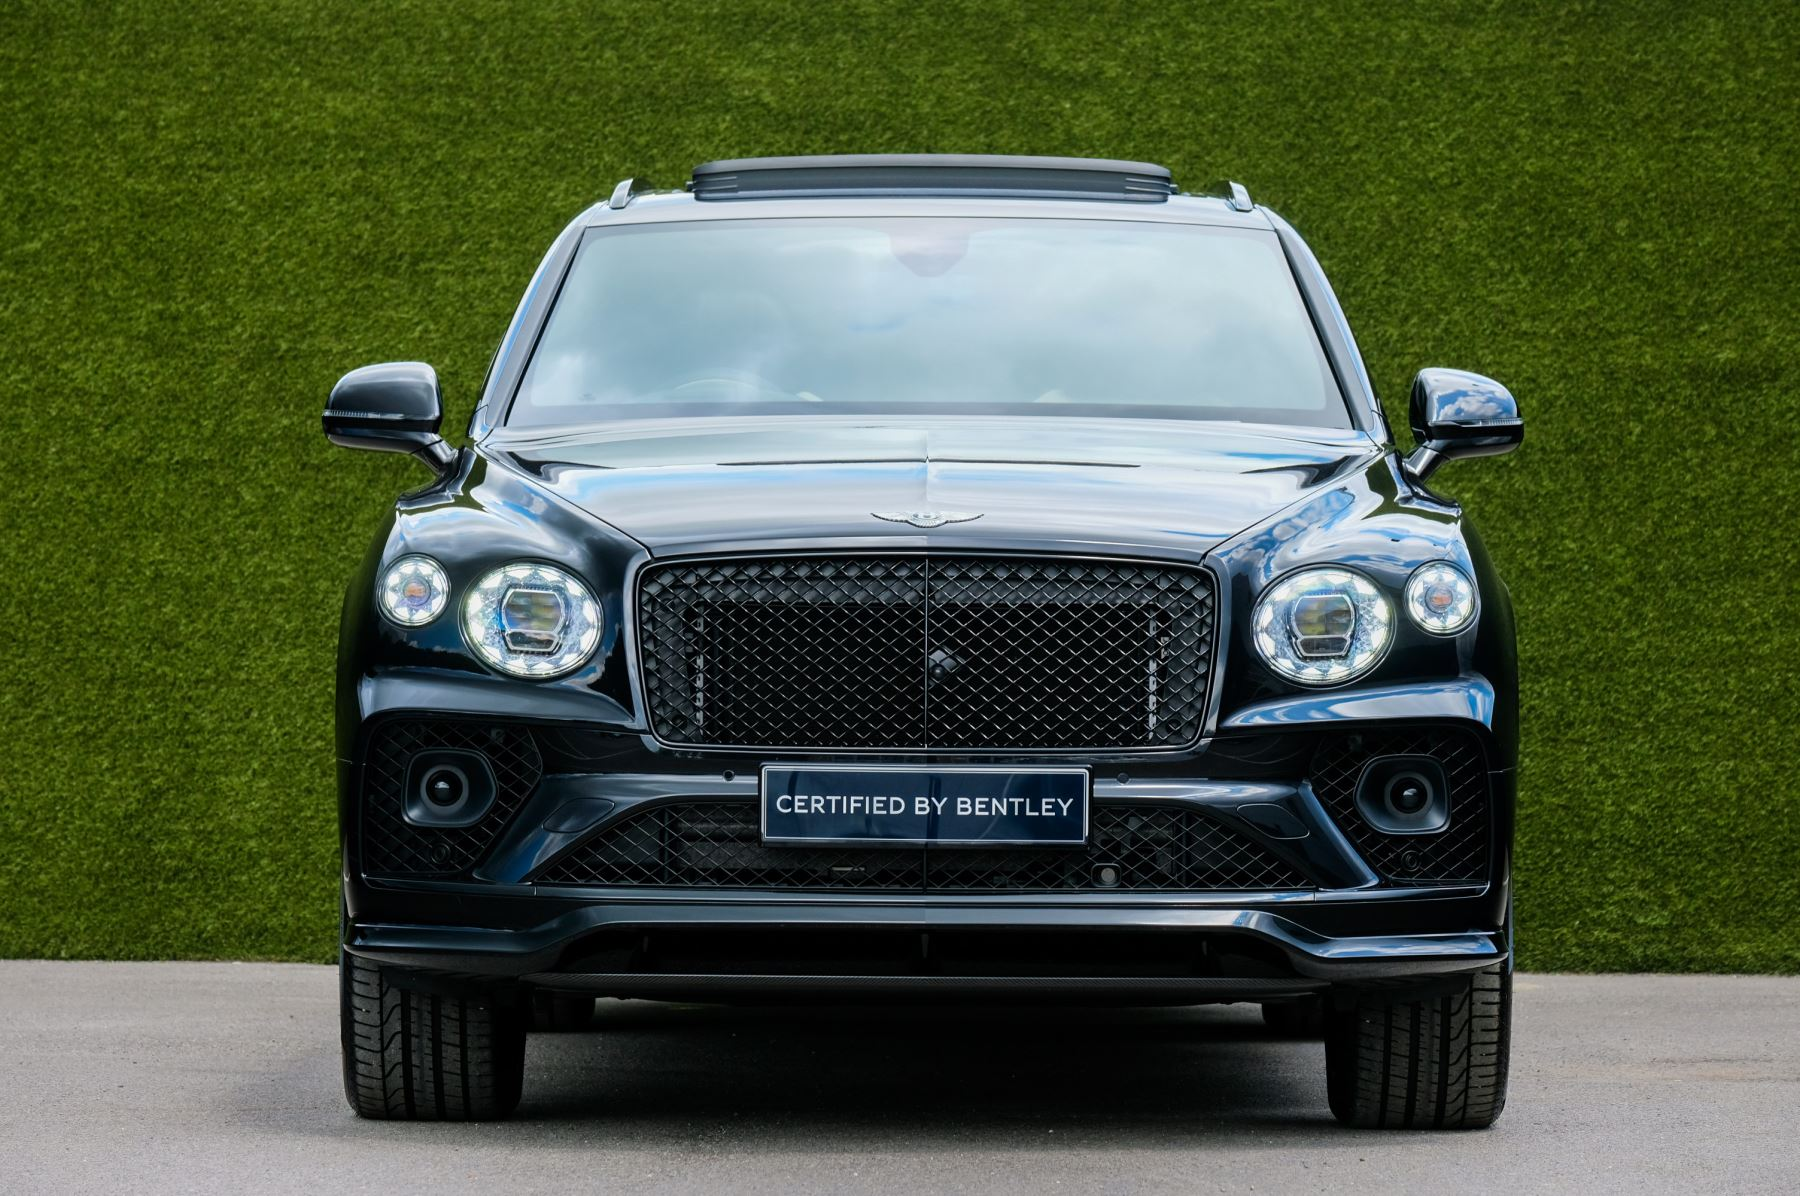 Bentley Bentayga 4.0 V8 - Mulliner Driving Specification for Black Specification image 2